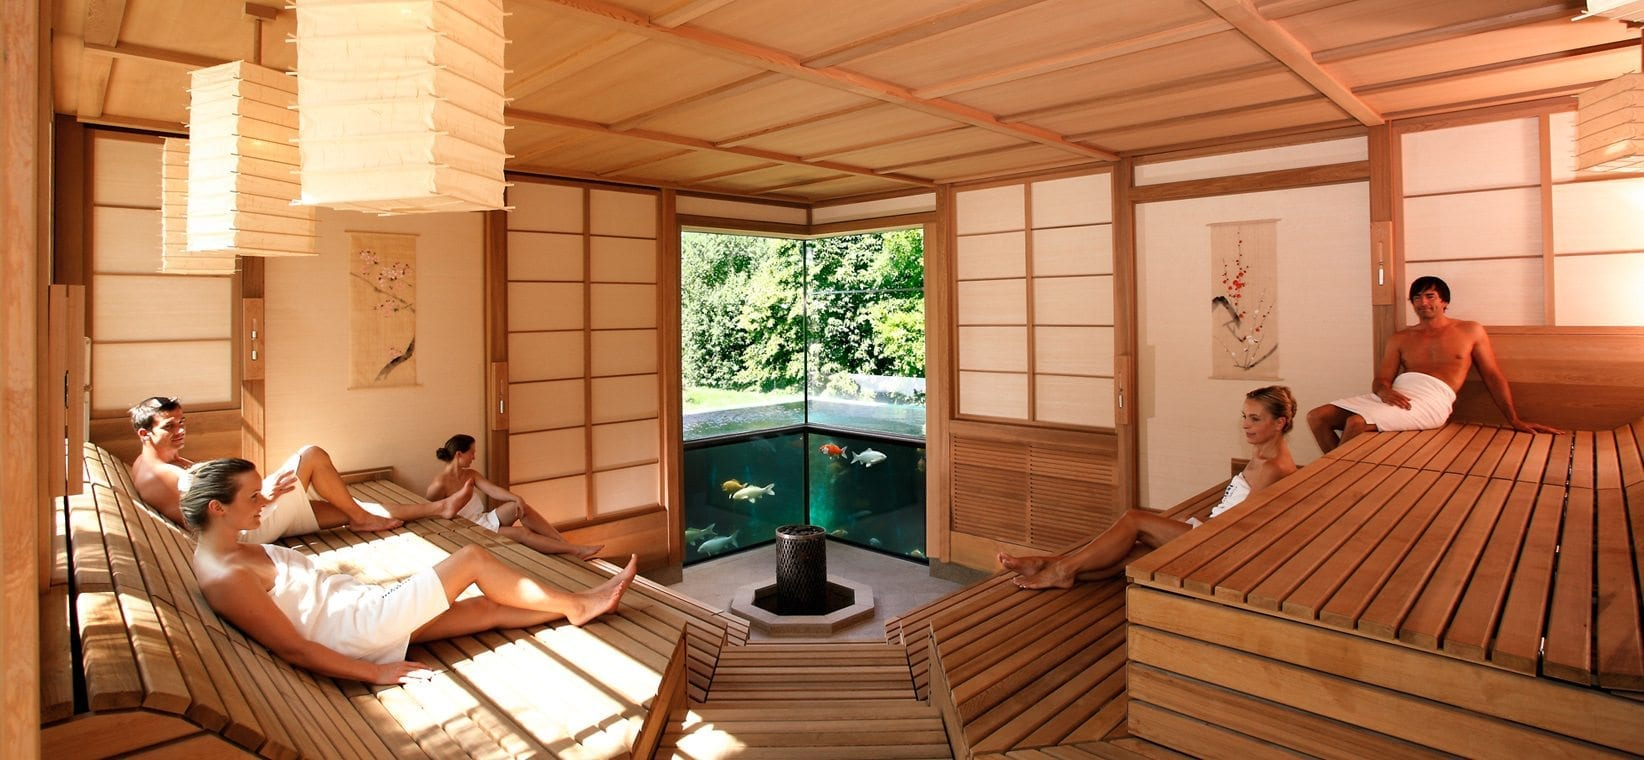 therme bad w rishofen vitalbad wellness saunen im allg u. Black Bedroom Furniture Sets. Home Design Ideas